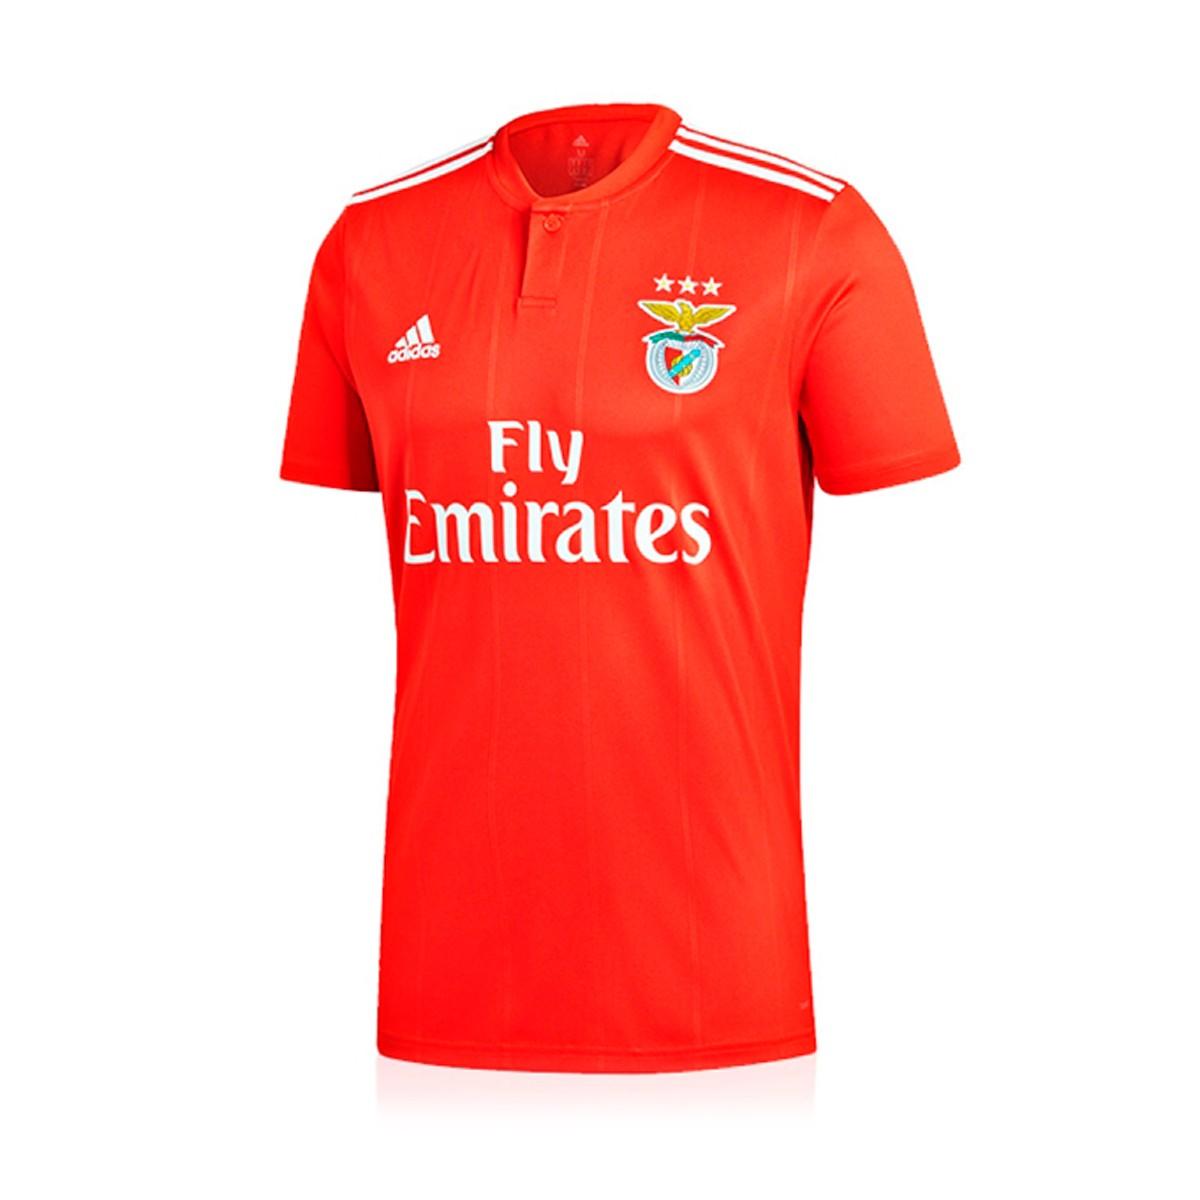 Camisola adidas SL Benfica Equipamento Principal 2018-2019 Benfica ... 4f99c8704dc91